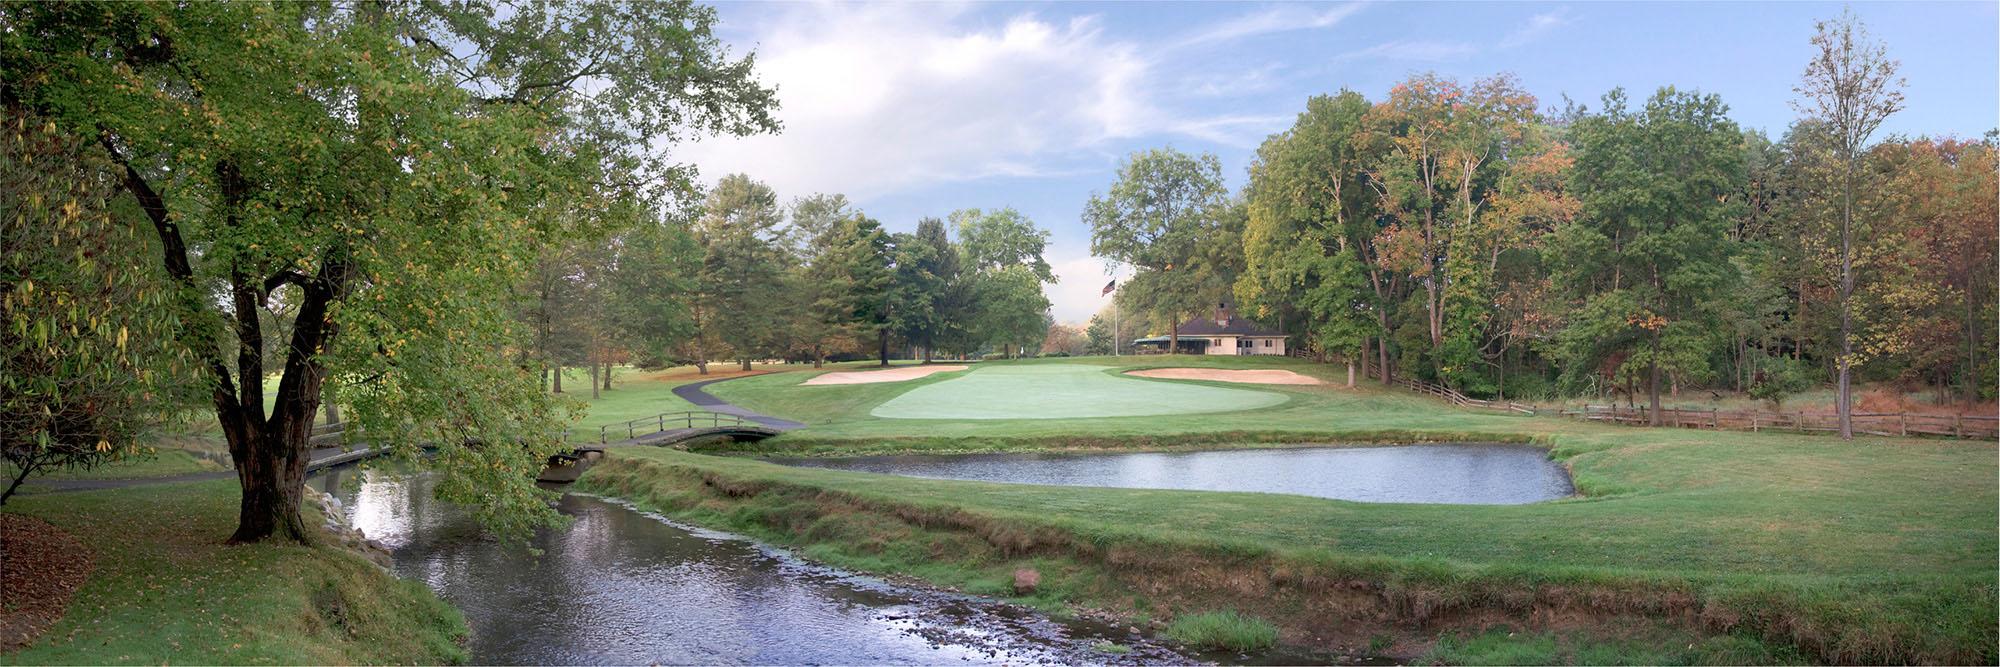 Golf Course Image - Saucon Valley Grace No. 14